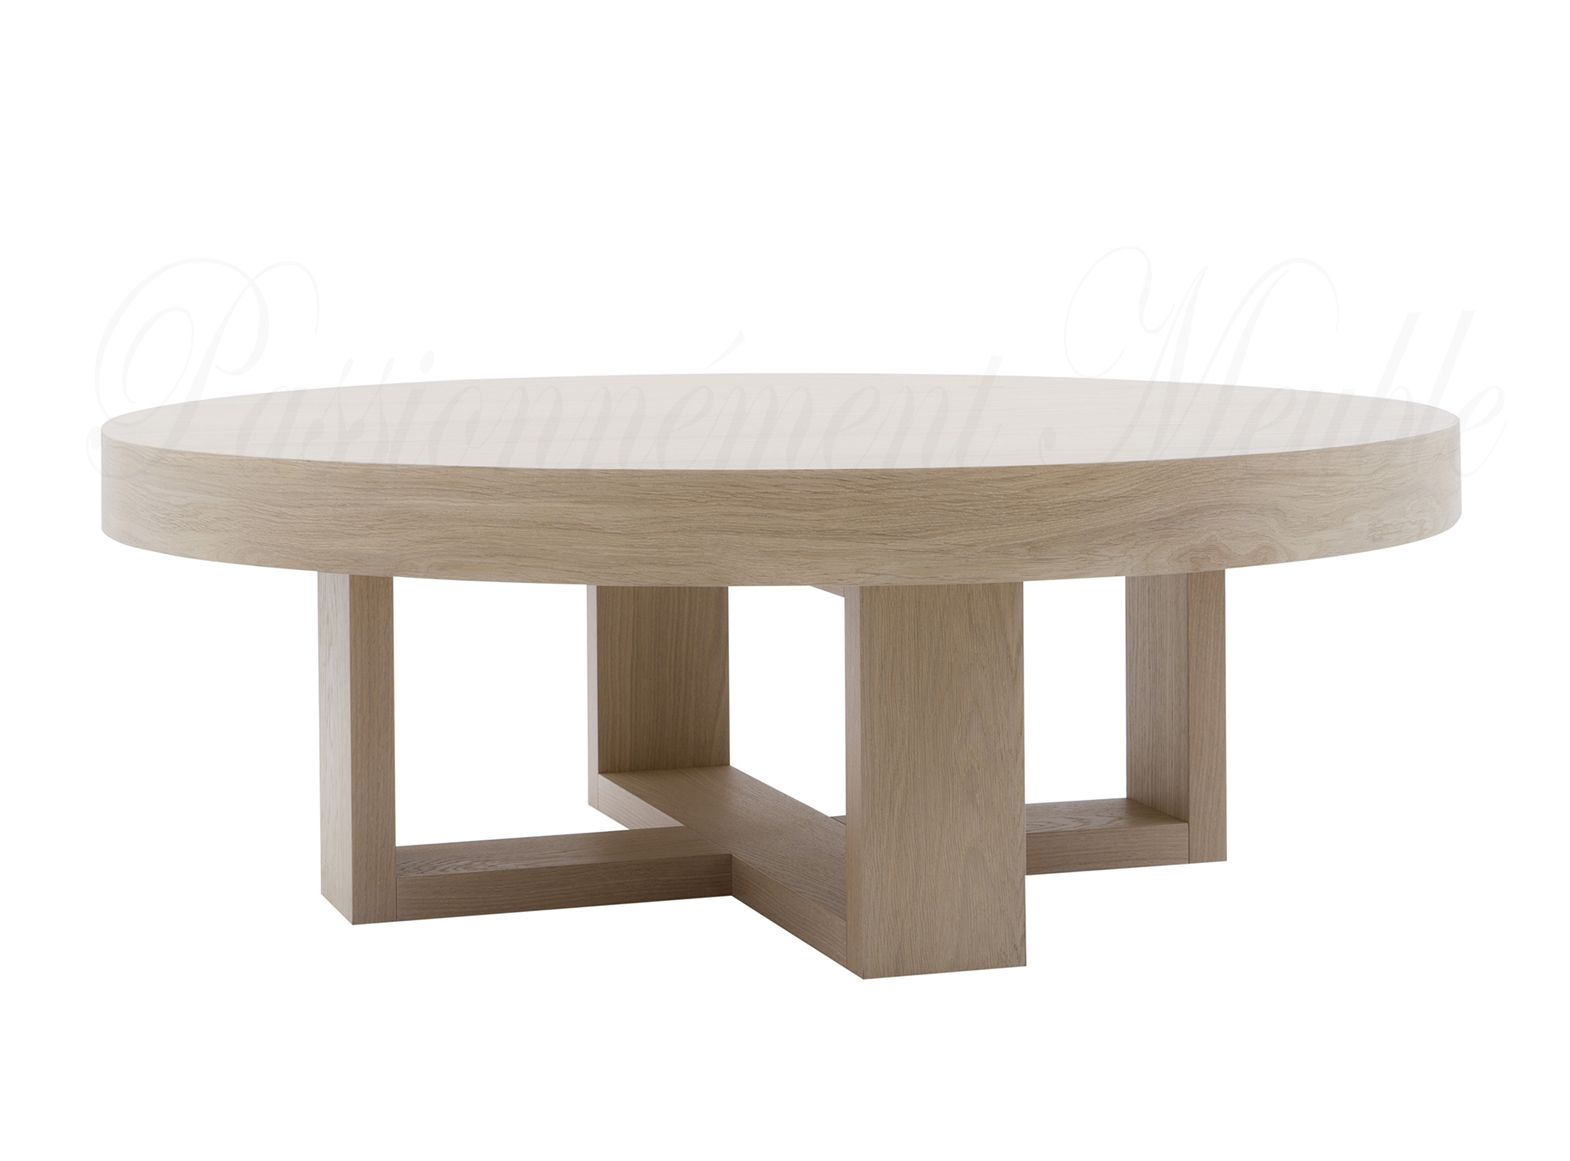 table basse luz interiors croix ronde 120 cm. Black Bedroom Furniture Sets. Home Design Ideas